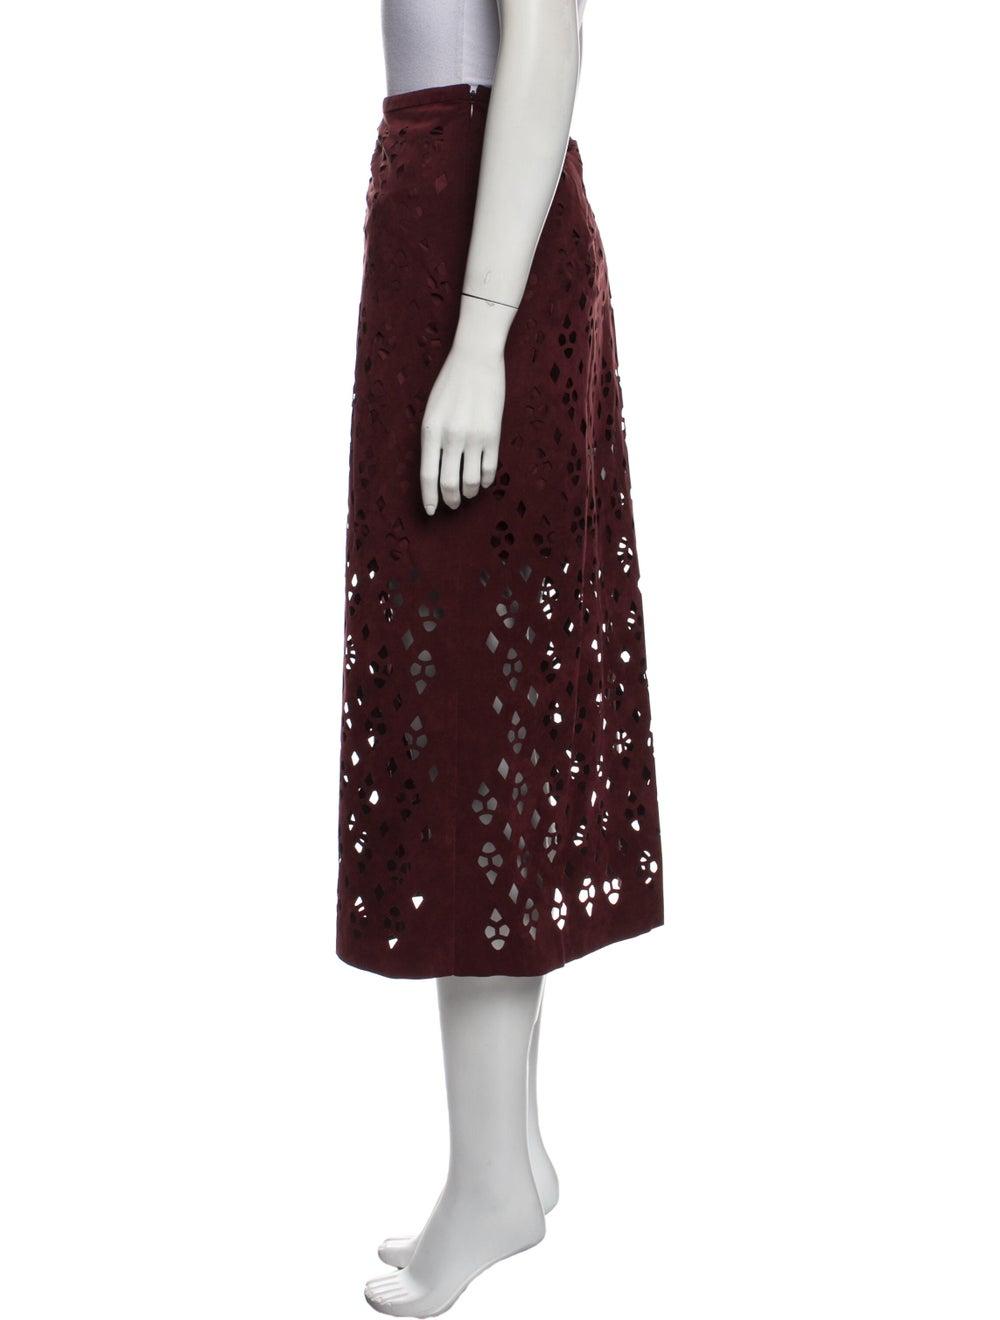 Tibi Patterned Midi Length Skirt - image 2